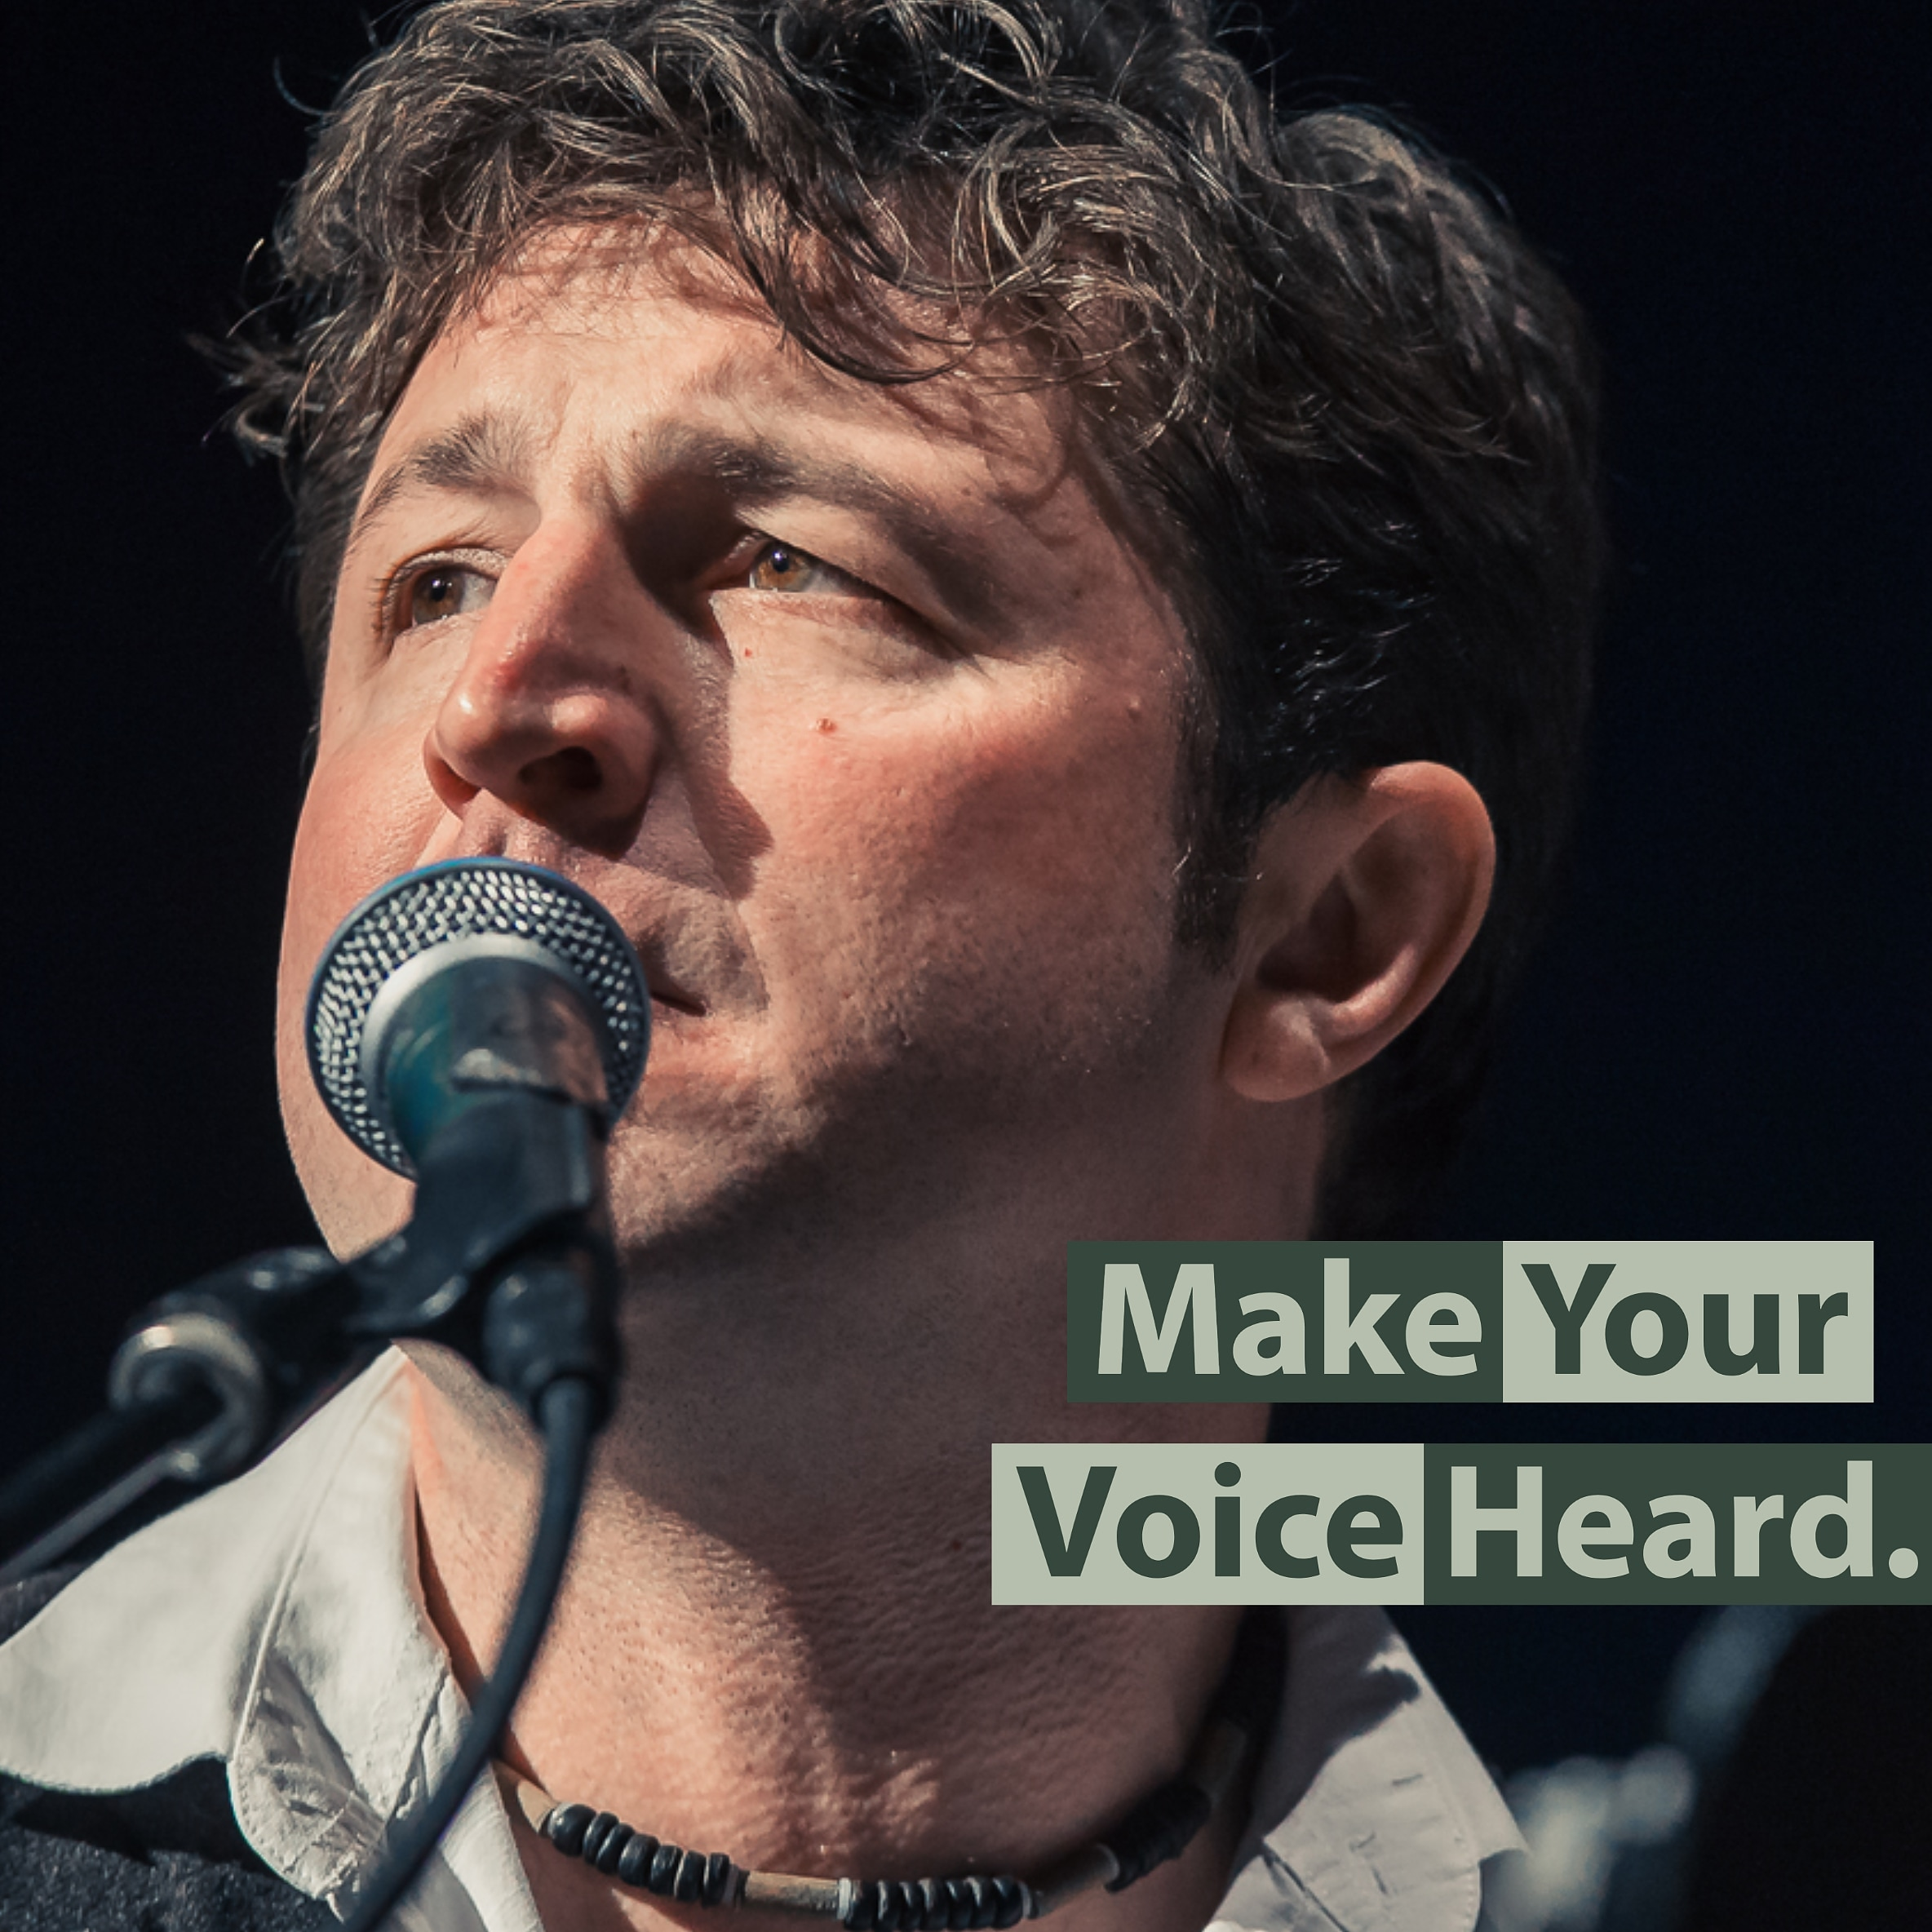 Make your voice heard.